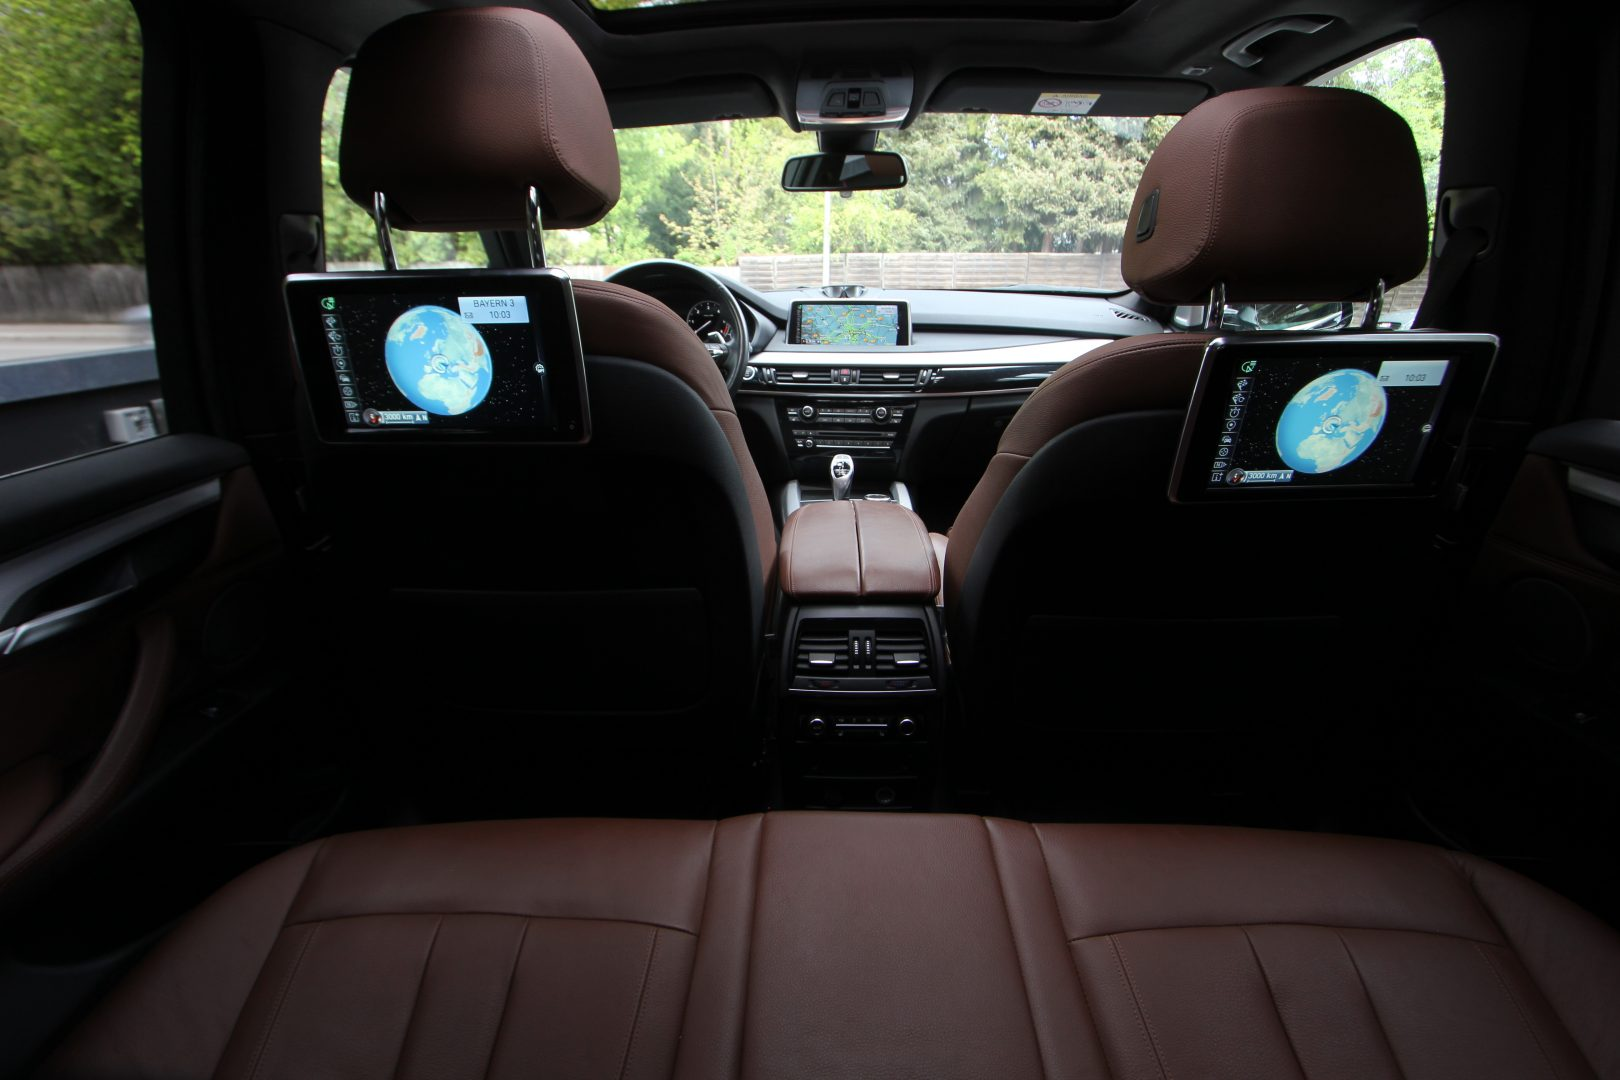 AIL BMW X5 M50d Bang & Olufsen Panorama RSE 13